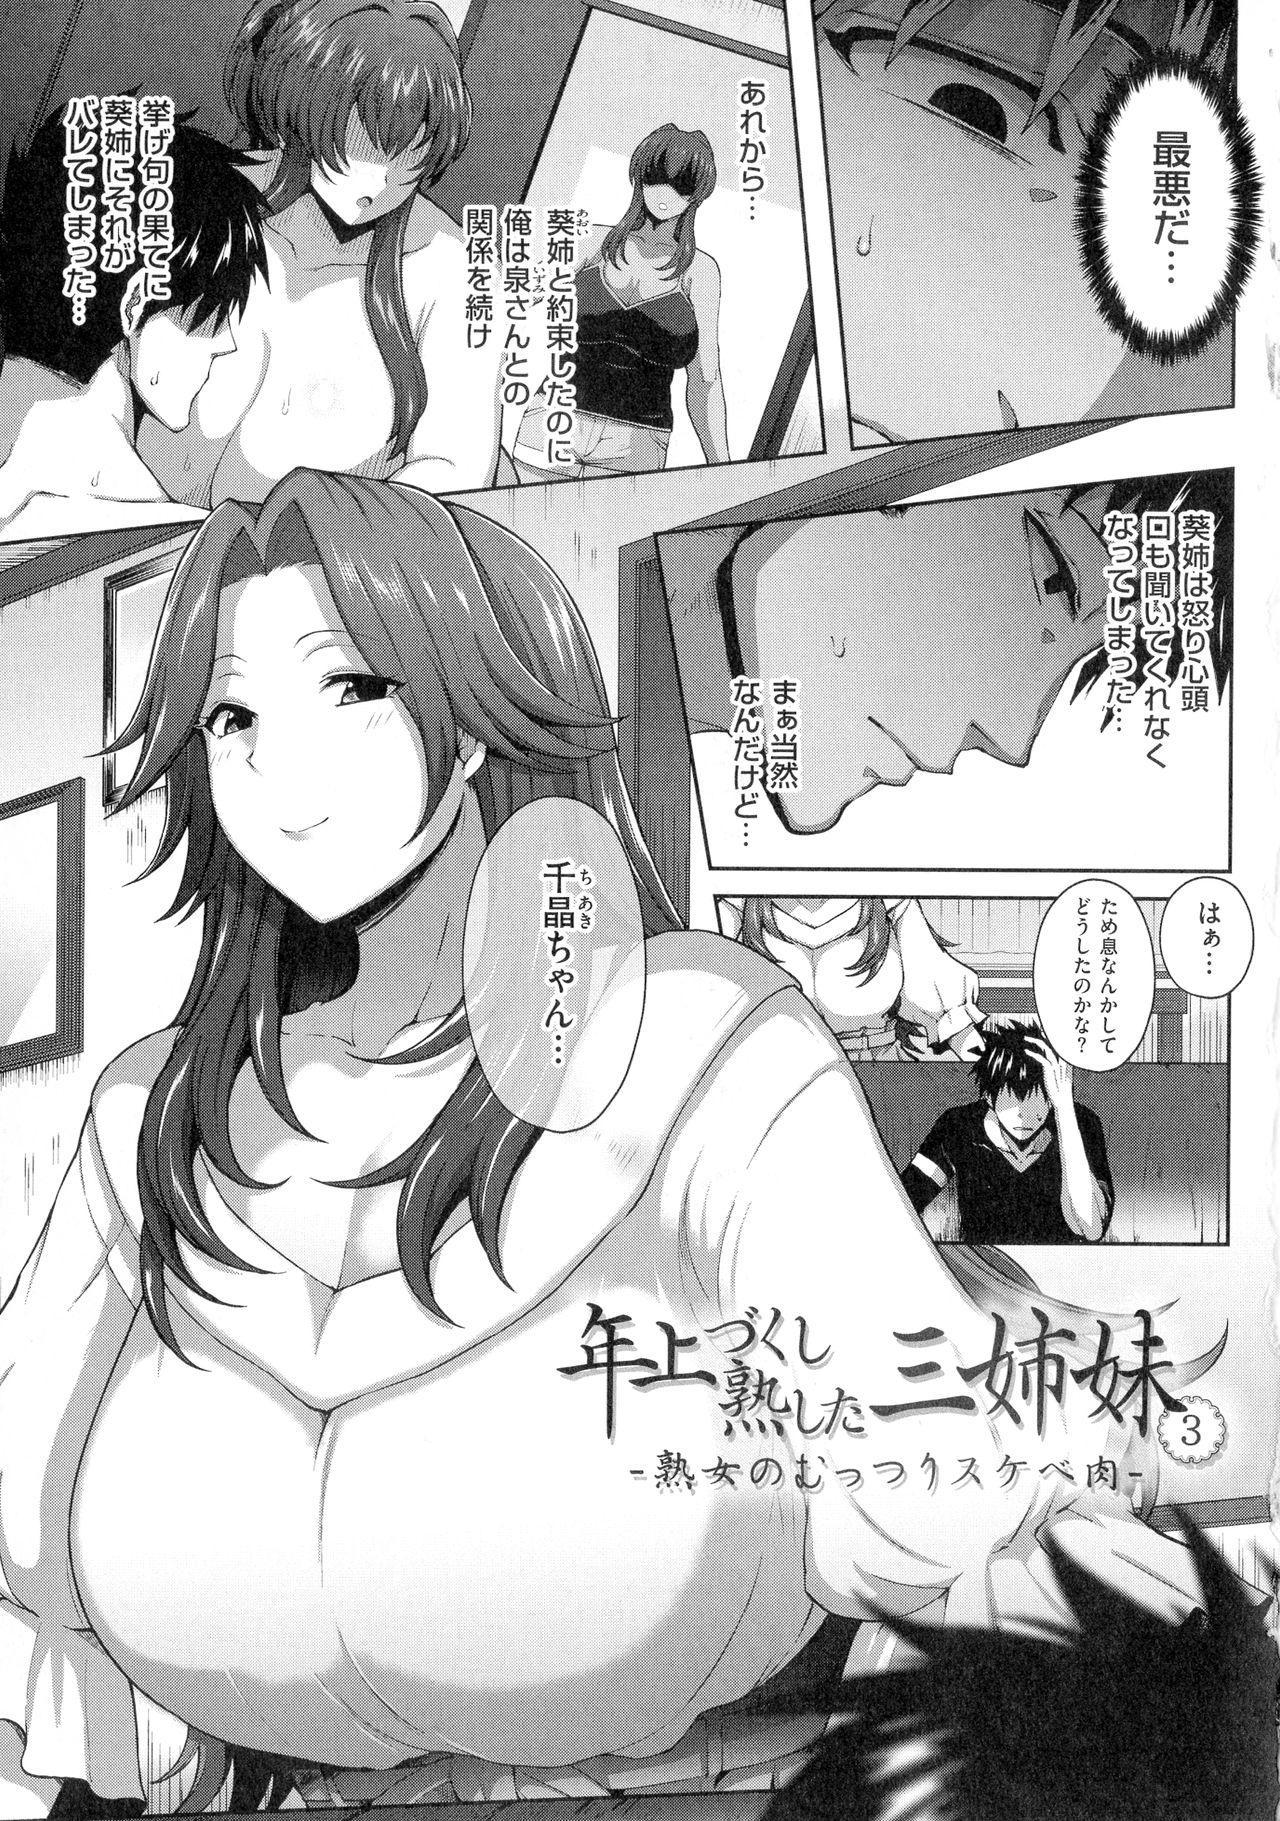 Juku Mesu - Erotic Mature Women 55